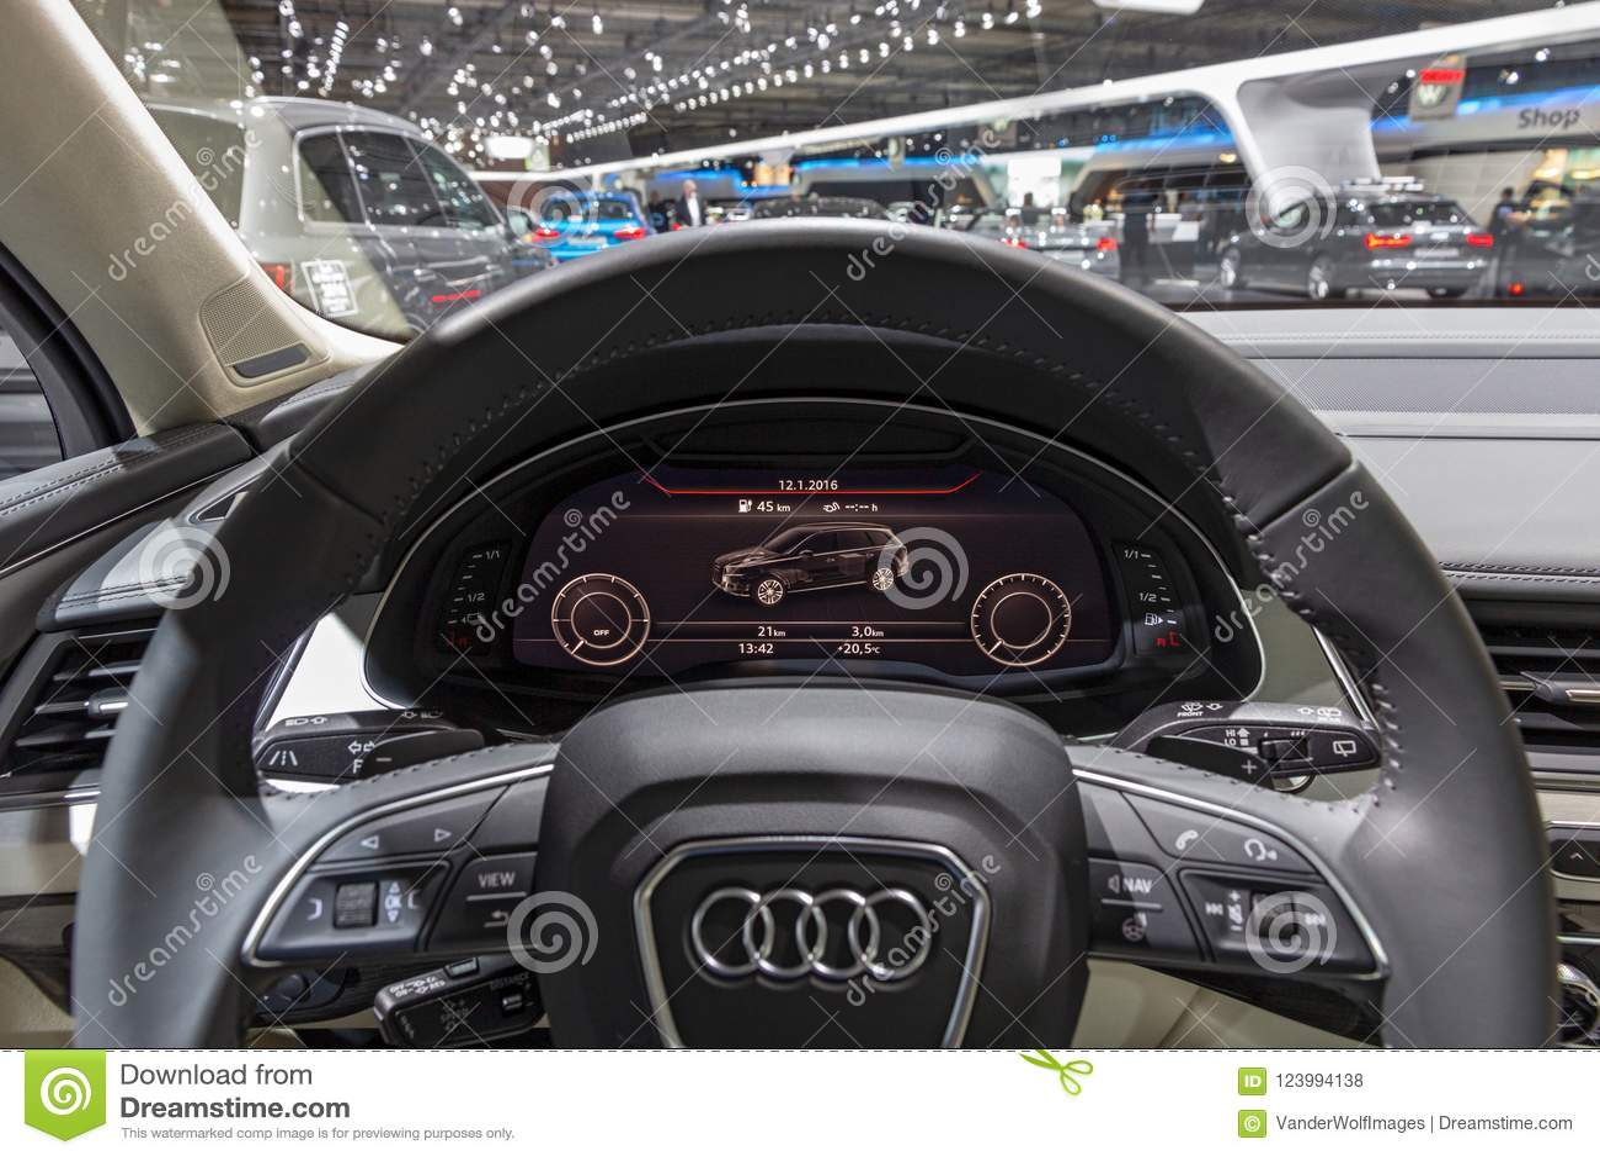 Download Audi Q7 Suv Car Dashboard Interior Editorial Stock Photo   Image  Of Interior, Wheel